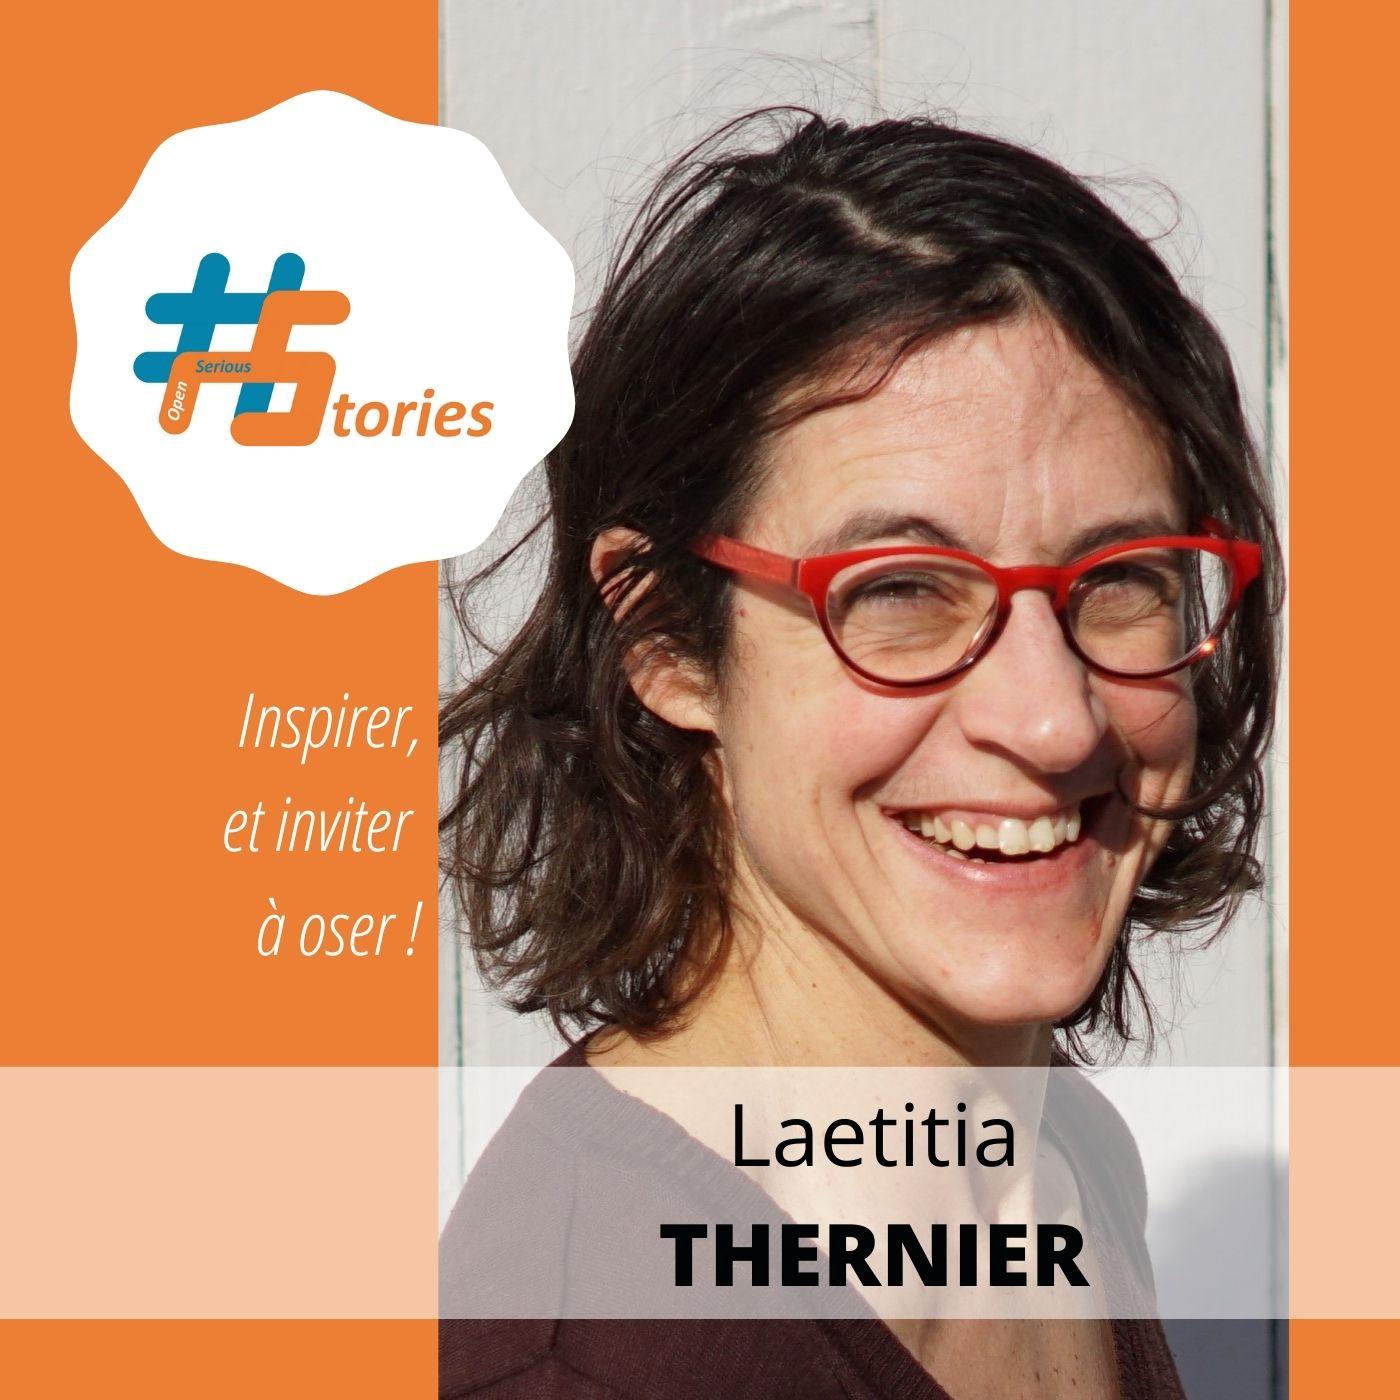 #OpenSeriousStories - Niveau 6 Créatrice - Laetitia Thernier